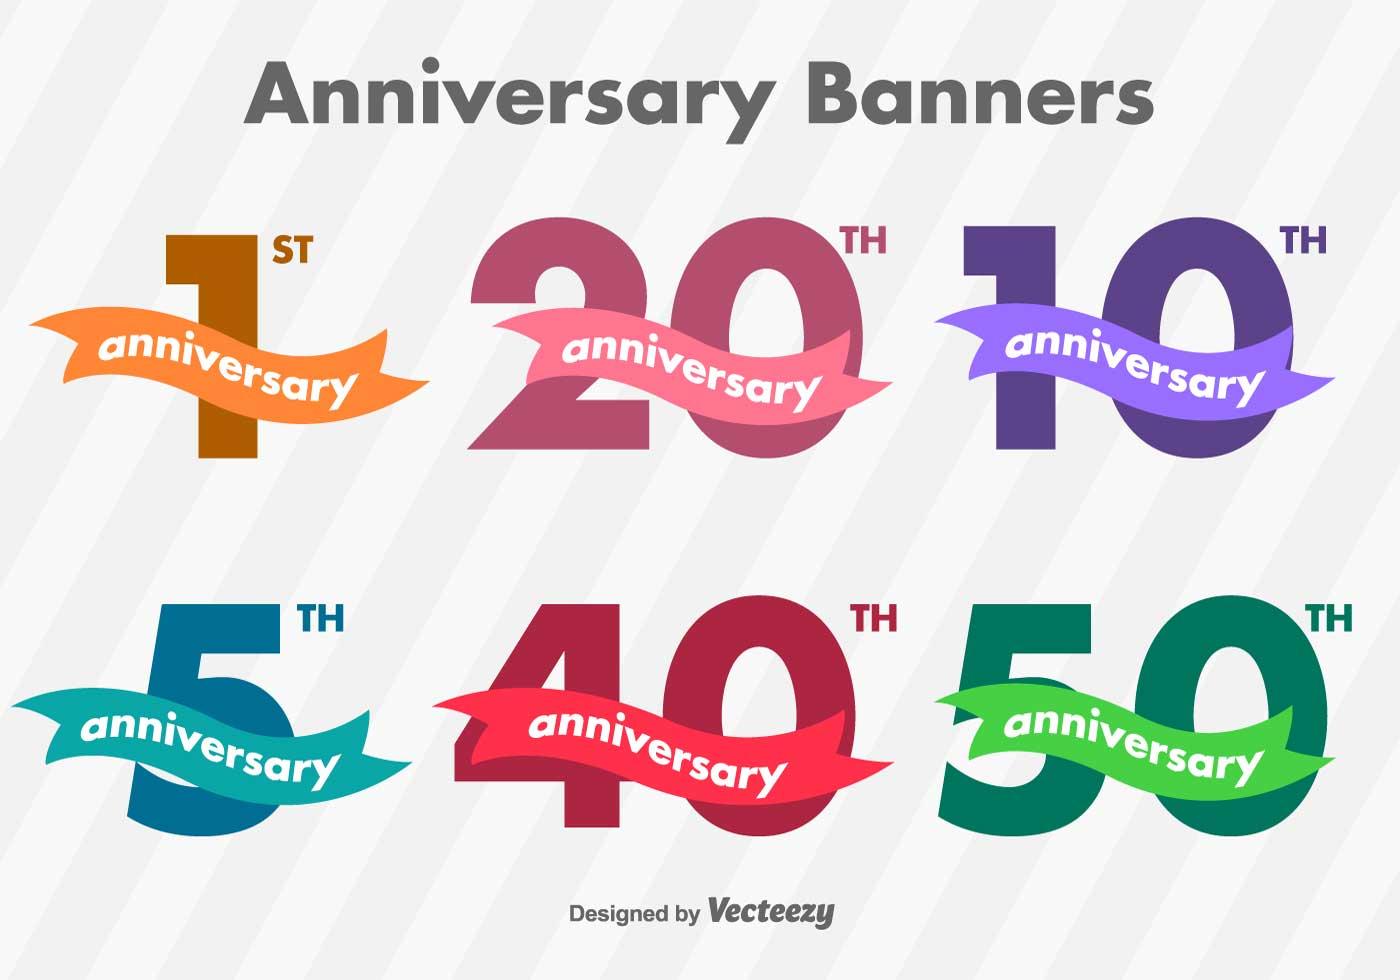 Anniversary banner free vector art downloads